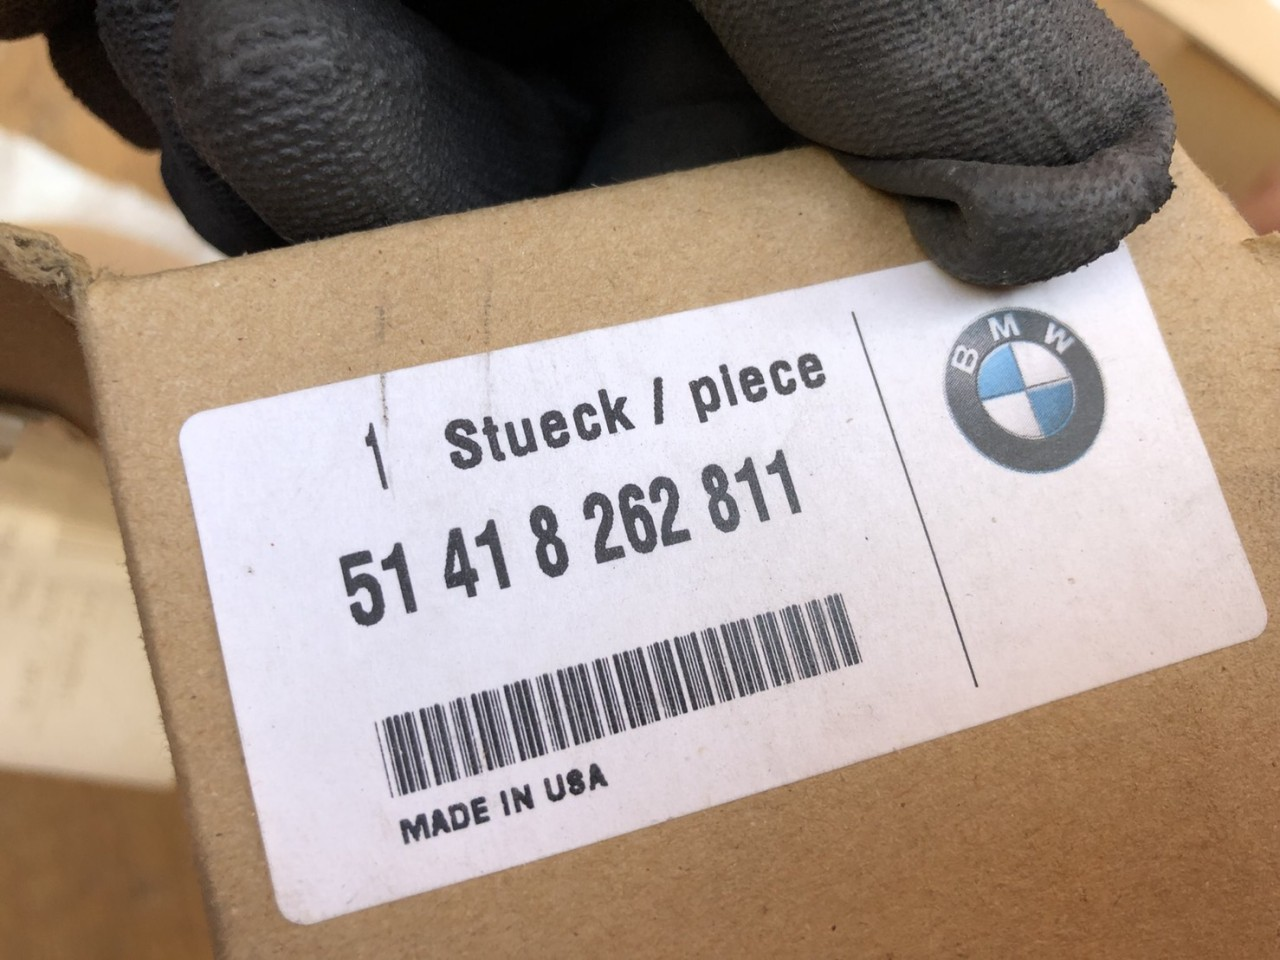 Vand maner usa interior stanga BMW X5 E53 51418262811